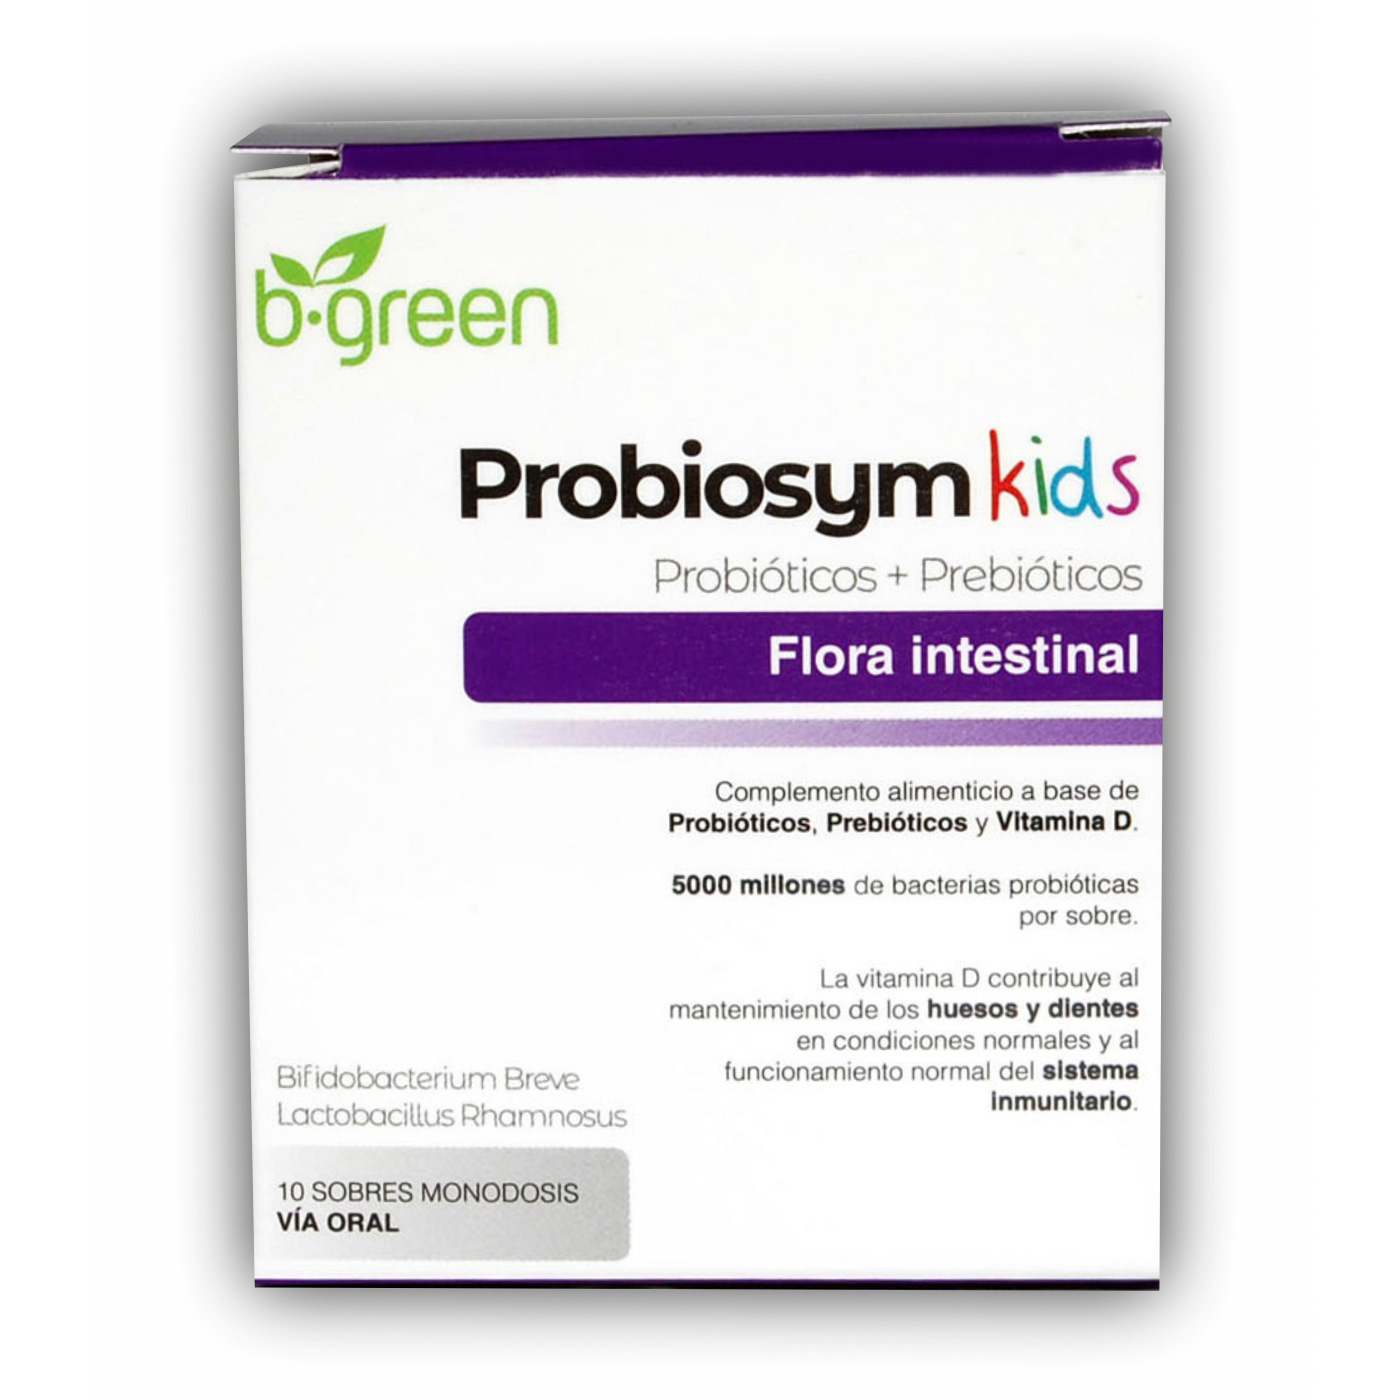 probiosym